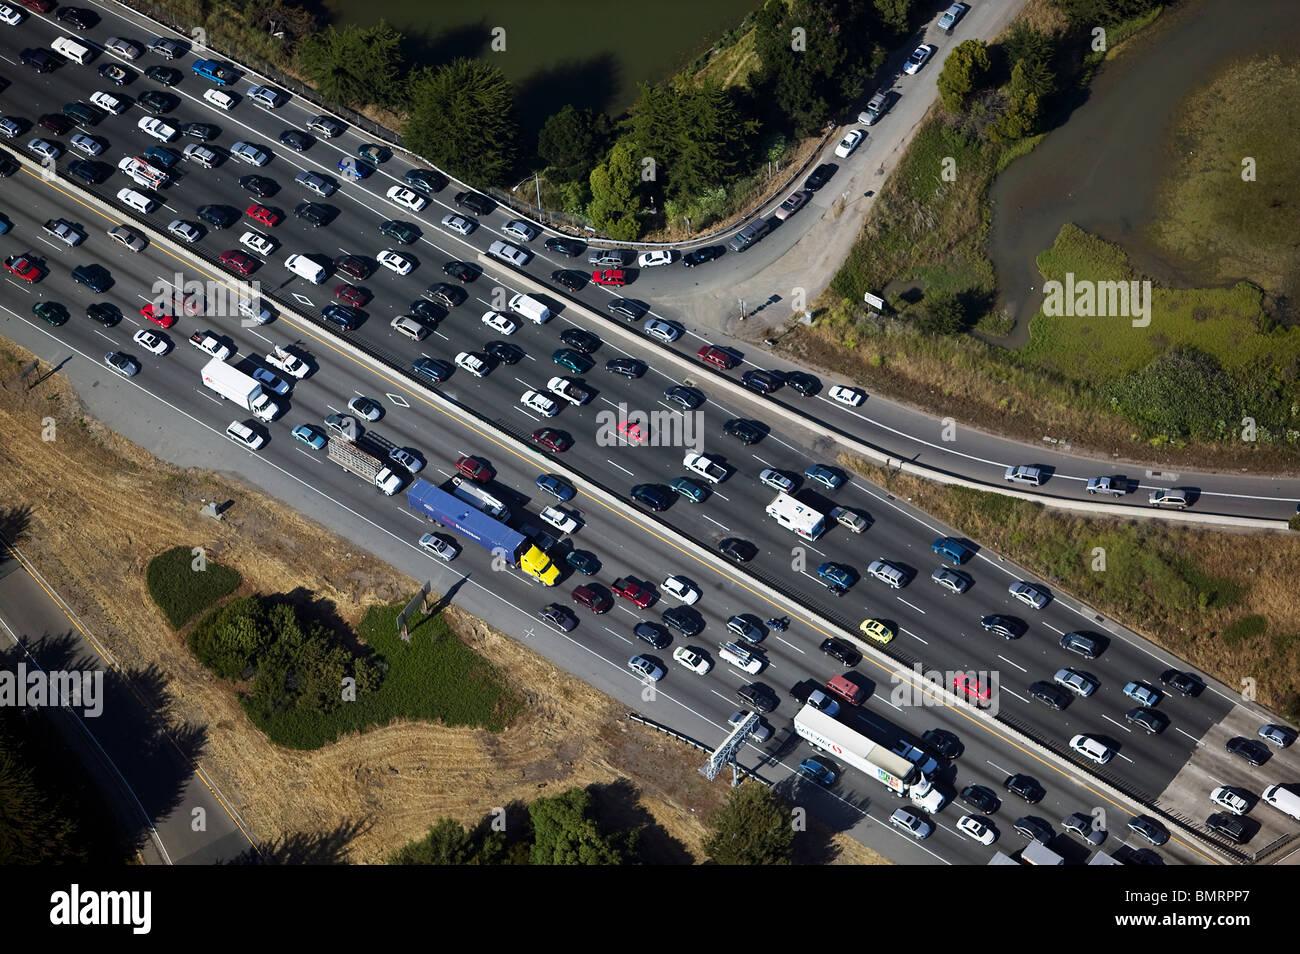 Vista aérea sobre atascos de tráfico interestatal 80 Berkeley Emeryville, California Imagen De Stock